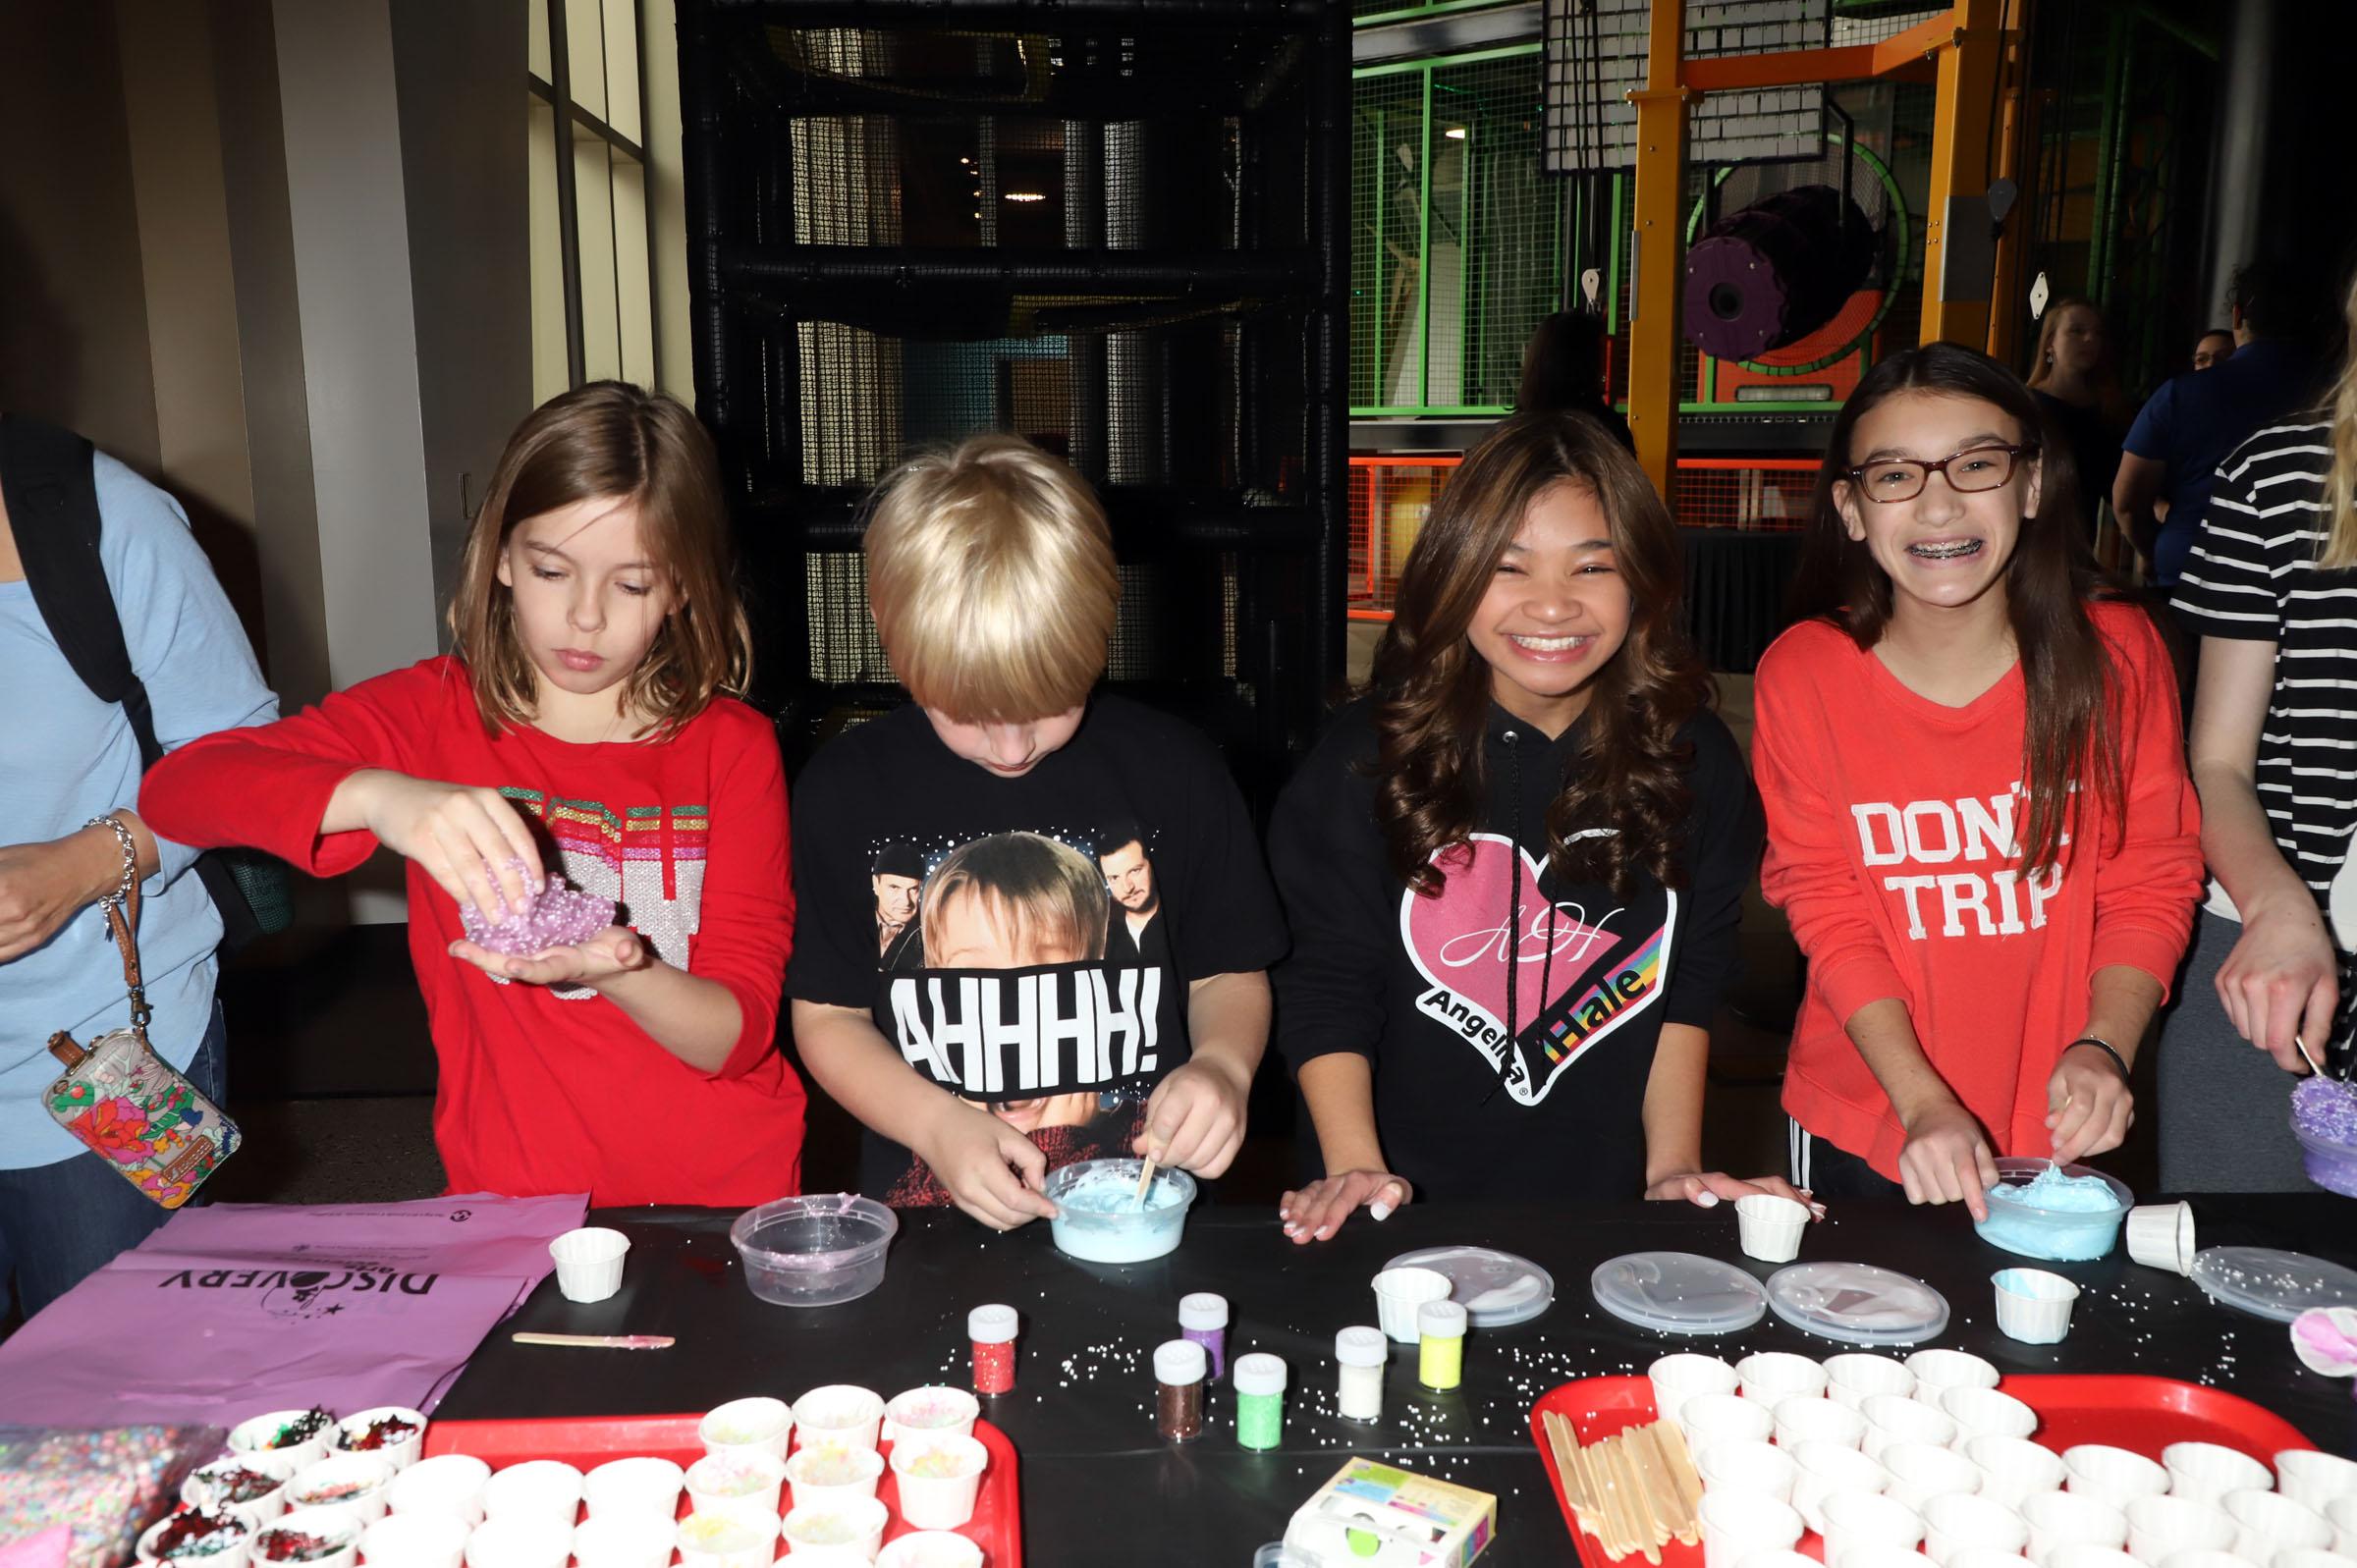 'America's Got Talent' runner up Angelica Hale hosts a Holiday Slime Workshop